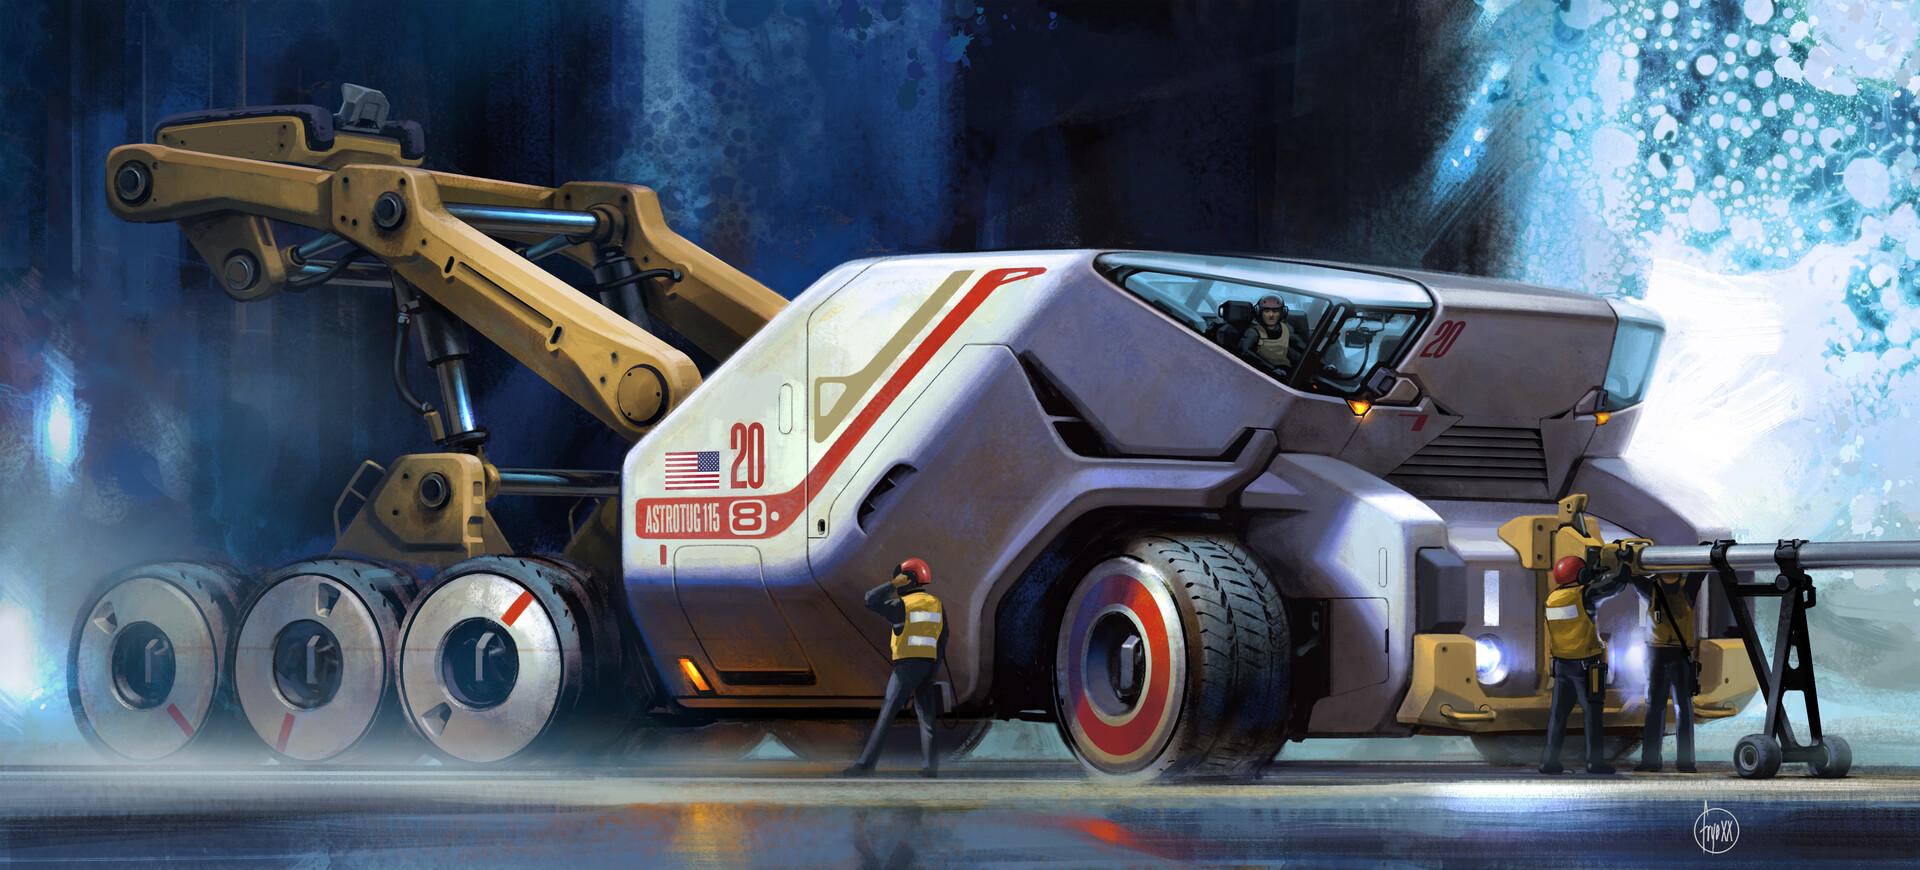 The Sci-Fi Vehicle Designs of John Frye